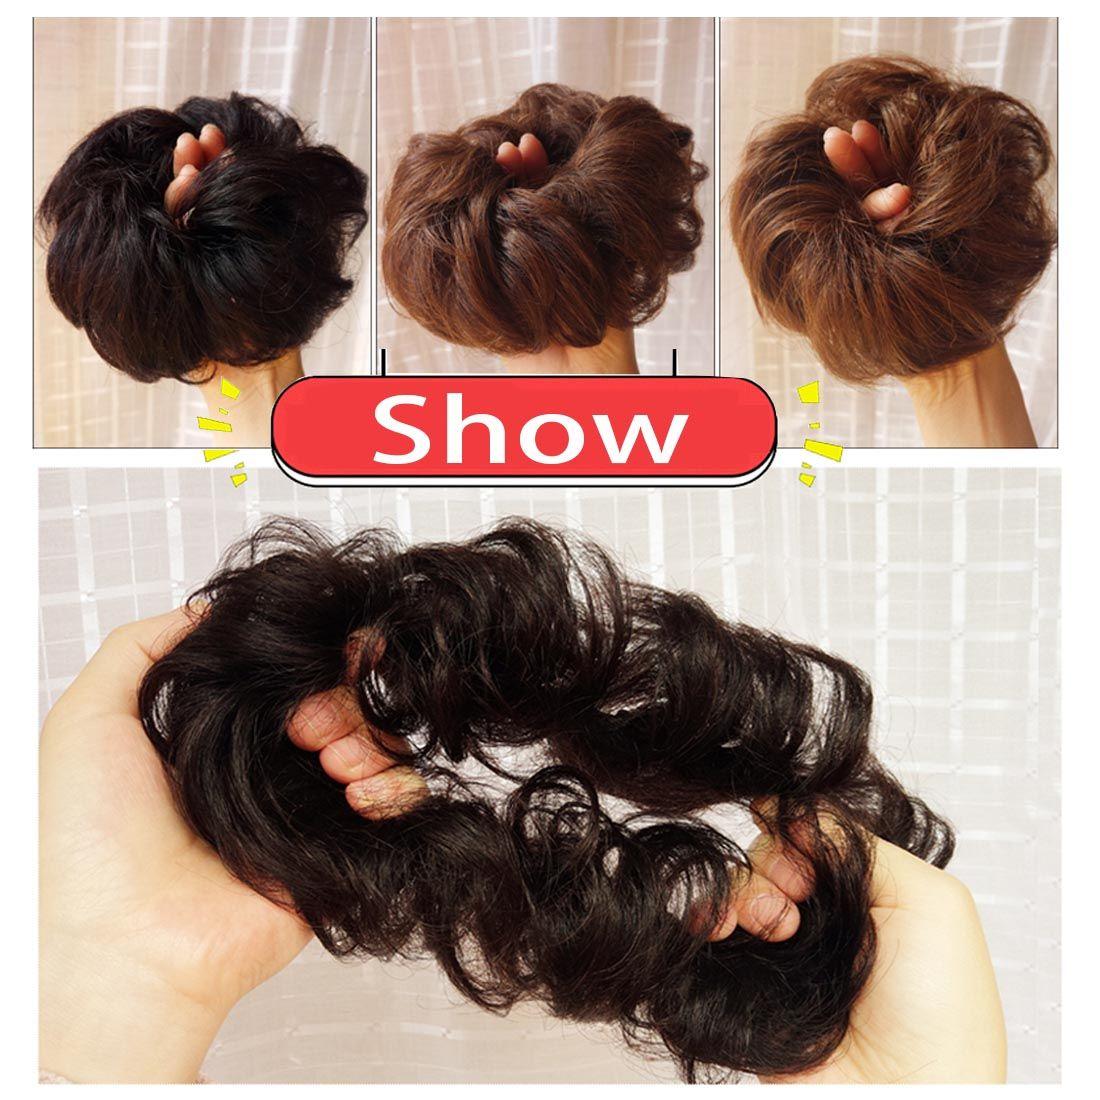 Clip en piezas Moño Donut moño Extensión Café oscuro cabello humano Postizos Updo de pelo para las mujeres Gril Señora